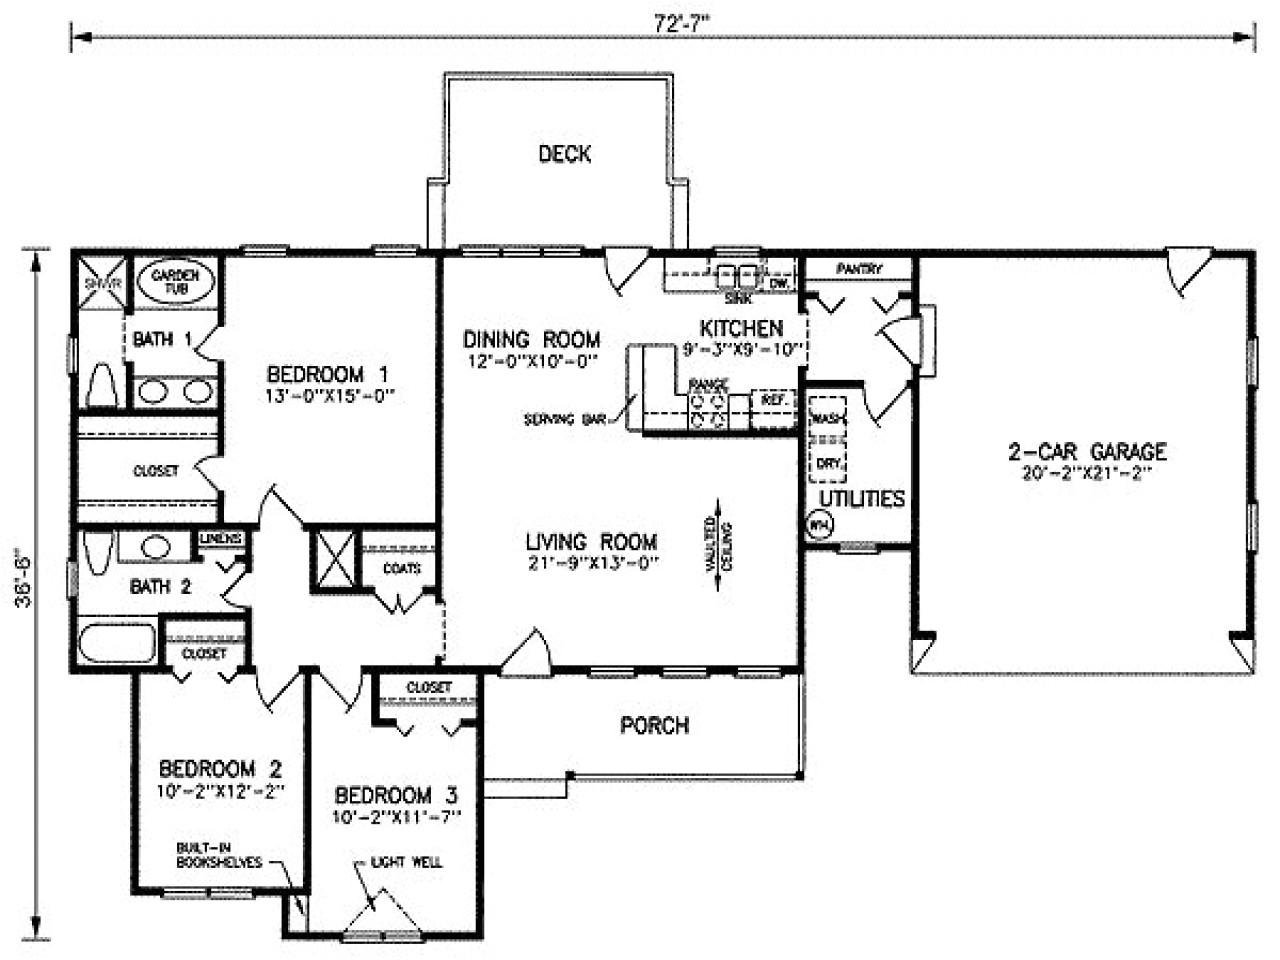 491317e8b68b2b98 open floor plan house plans 1500 sq ft 1500 square feet house plans